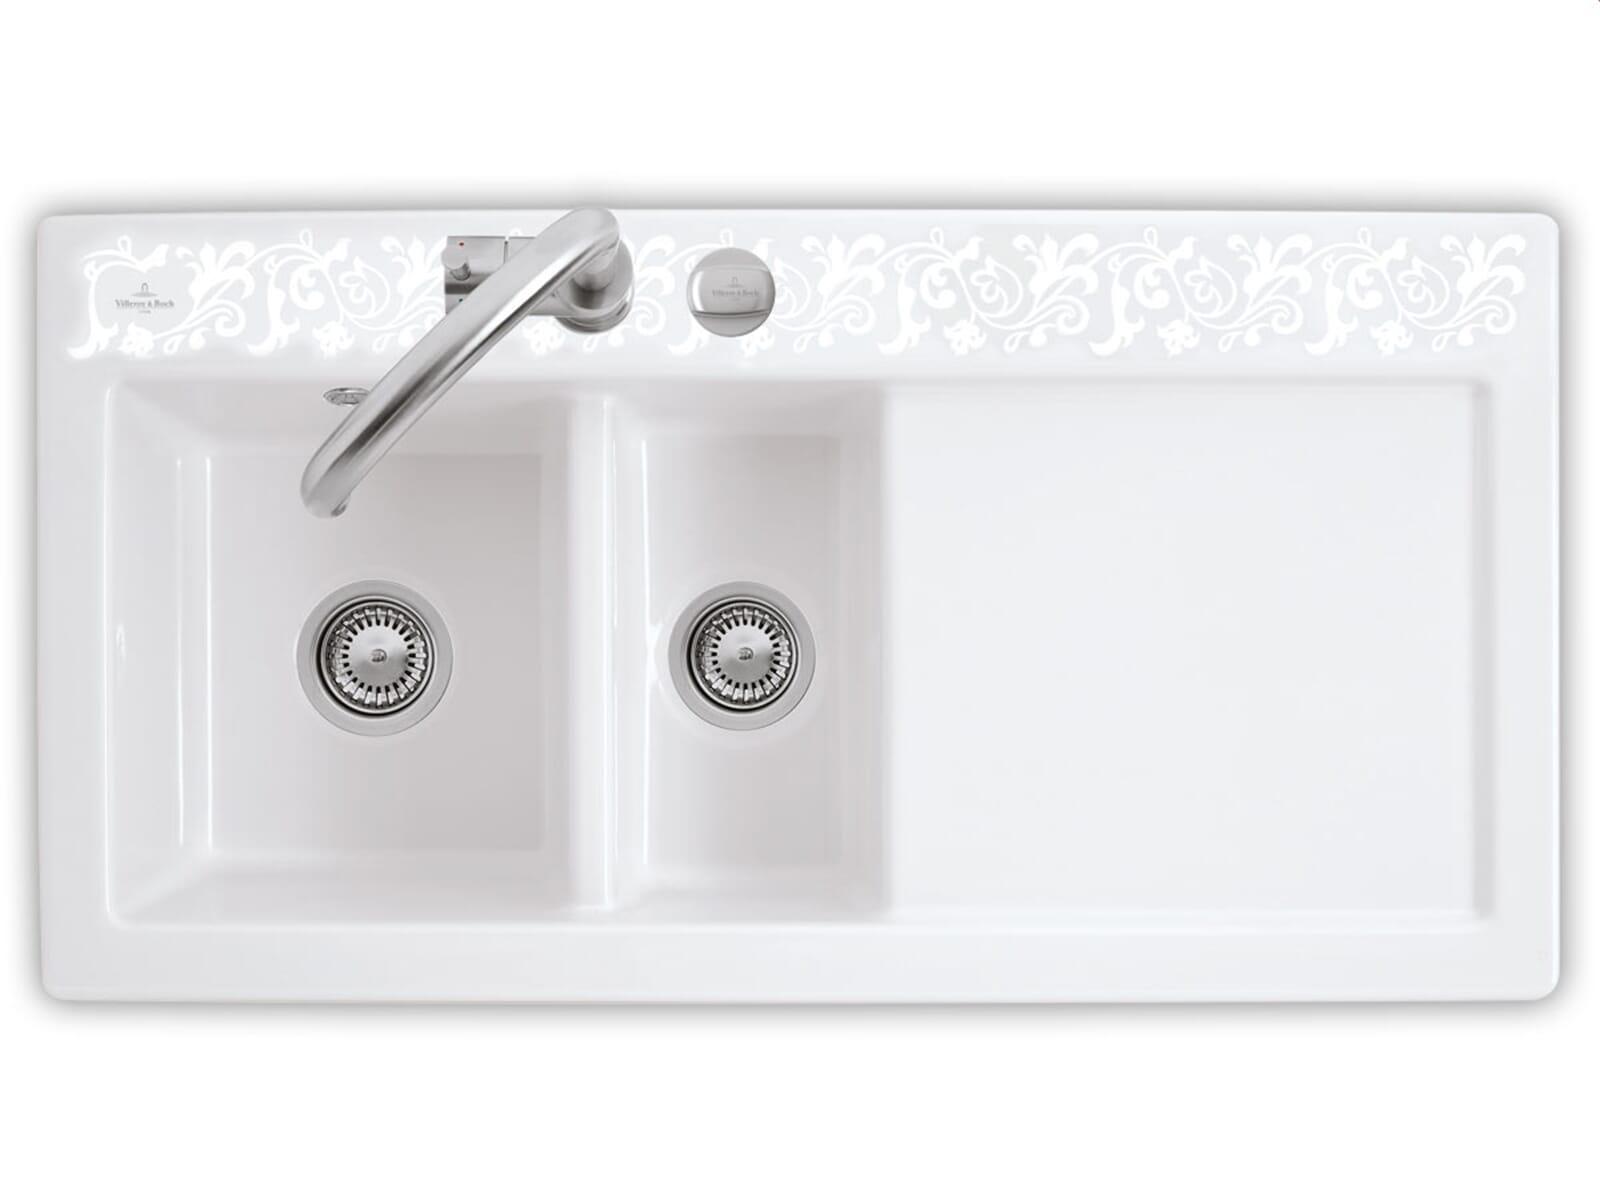 Villeroy & Boch Subway 60 XR White Pearl - 6720 02 KT Keramikspüle Exzenterbetätigung